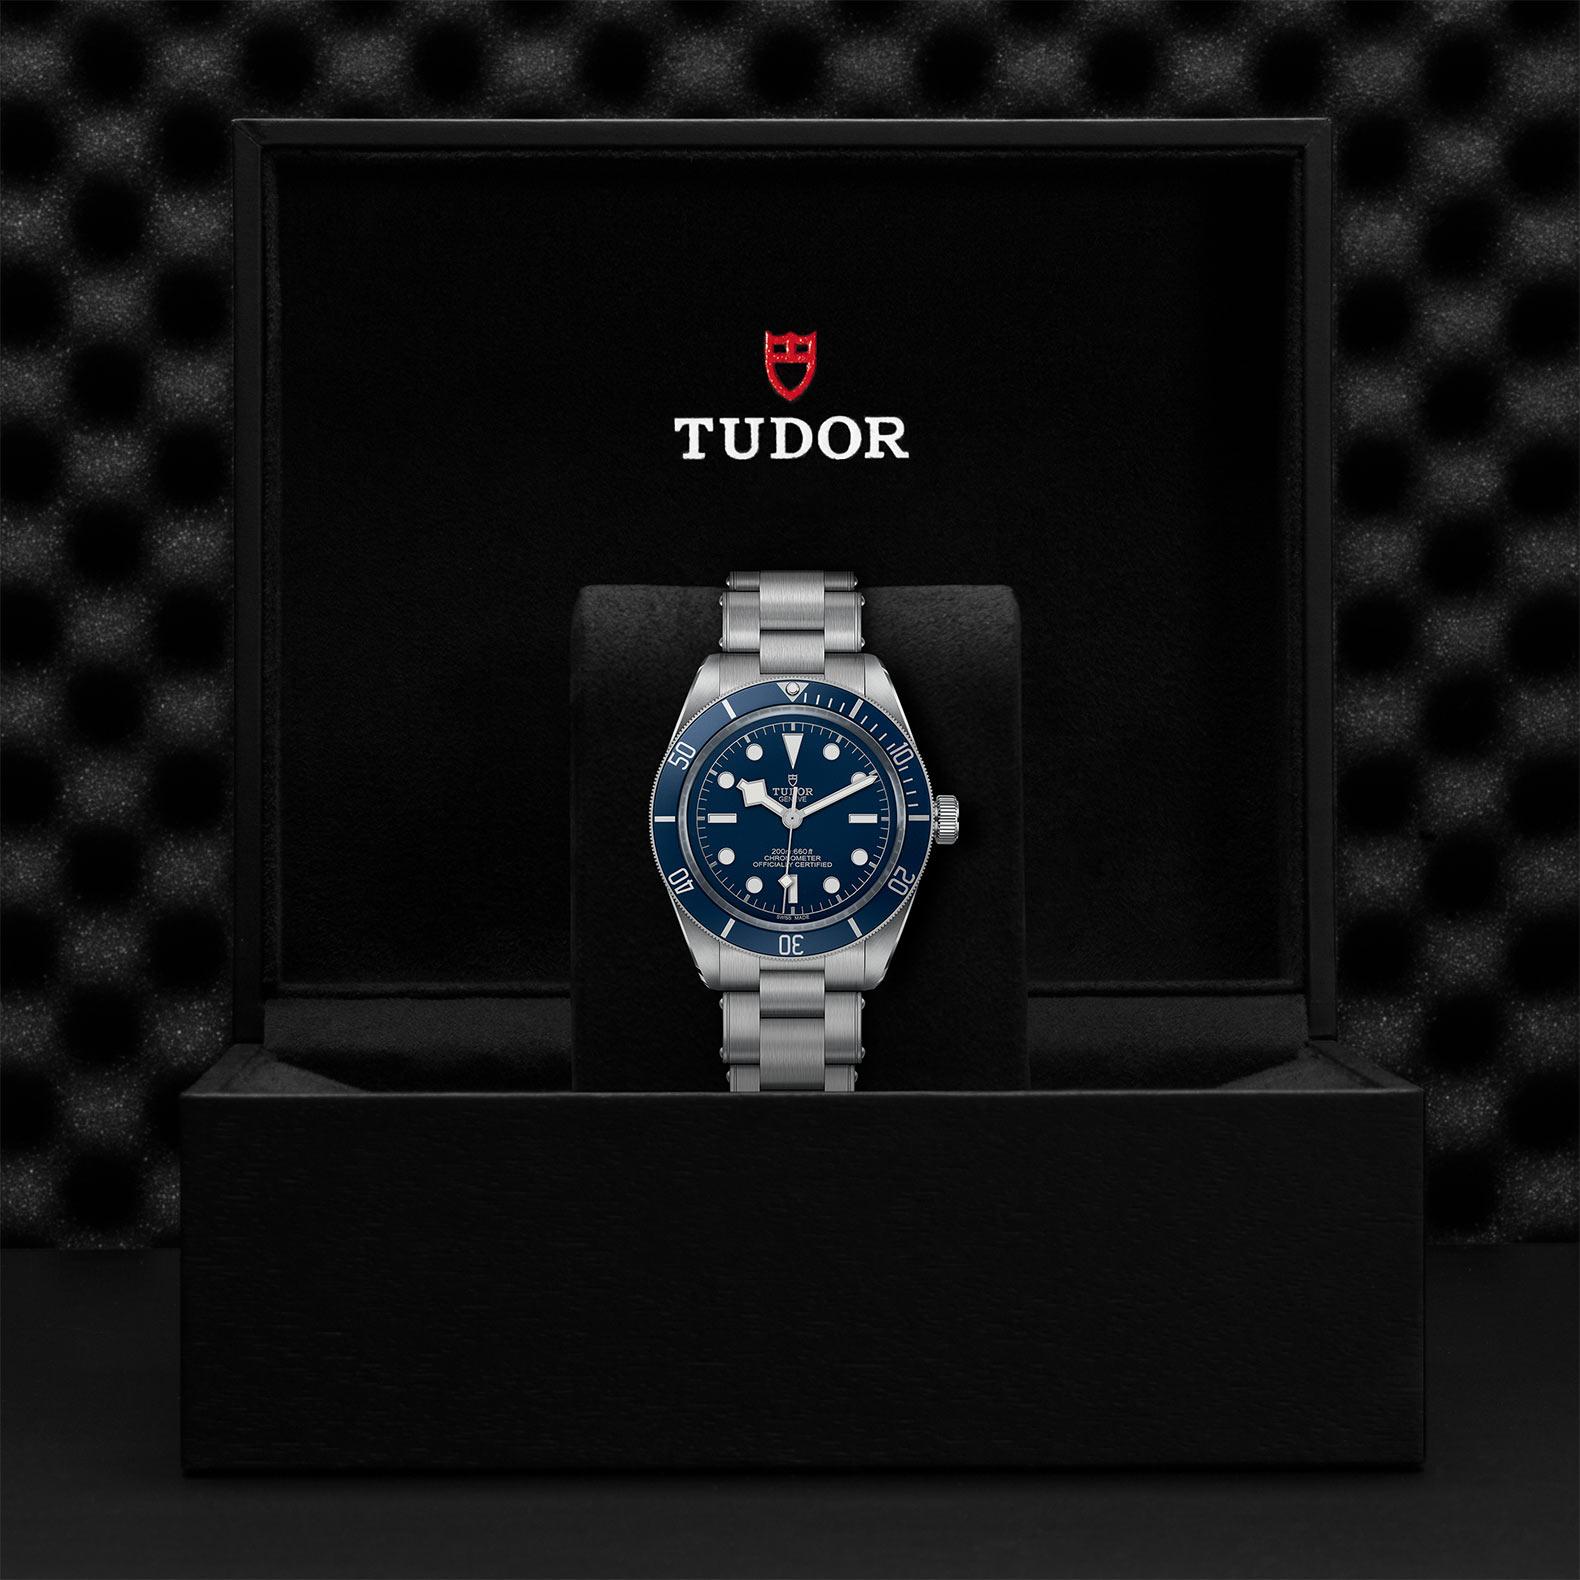 TUDOR Black Bay Fifty-Eight - M79030B-0001